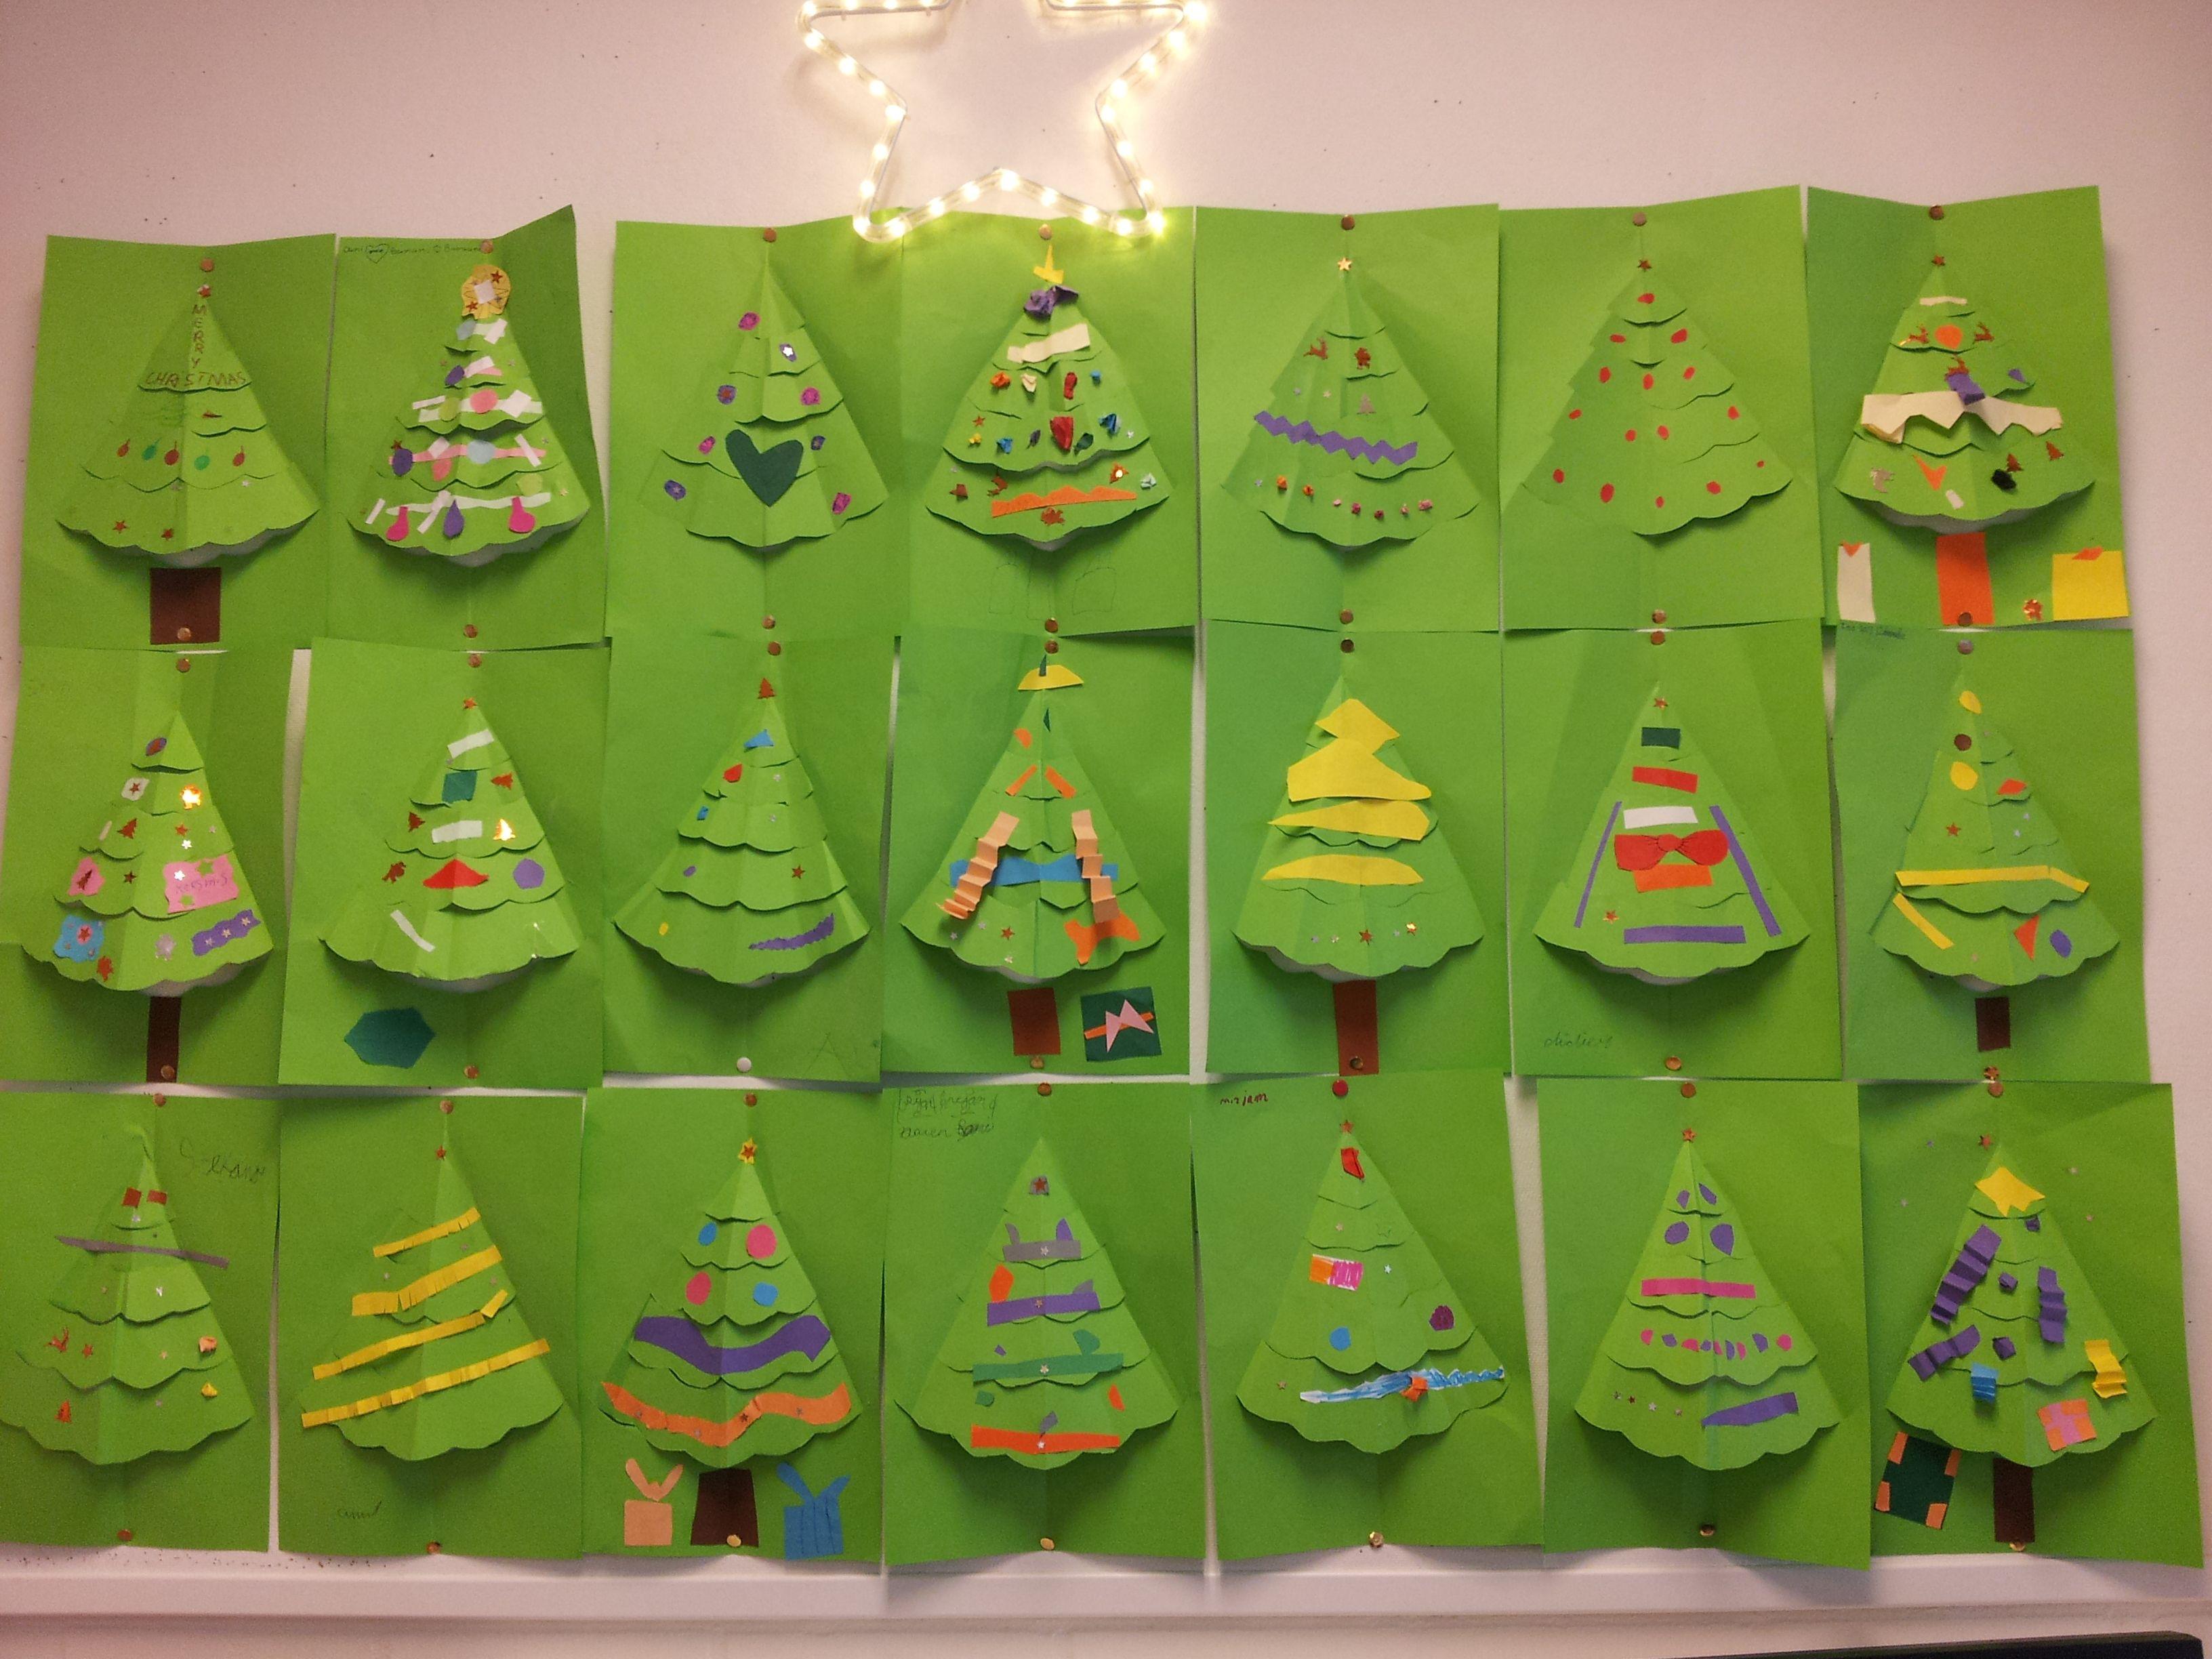 Kleurplaten Kerst Groep 5.Beautiful Kleurplaten Kerst Groep 5 Kleurplaten